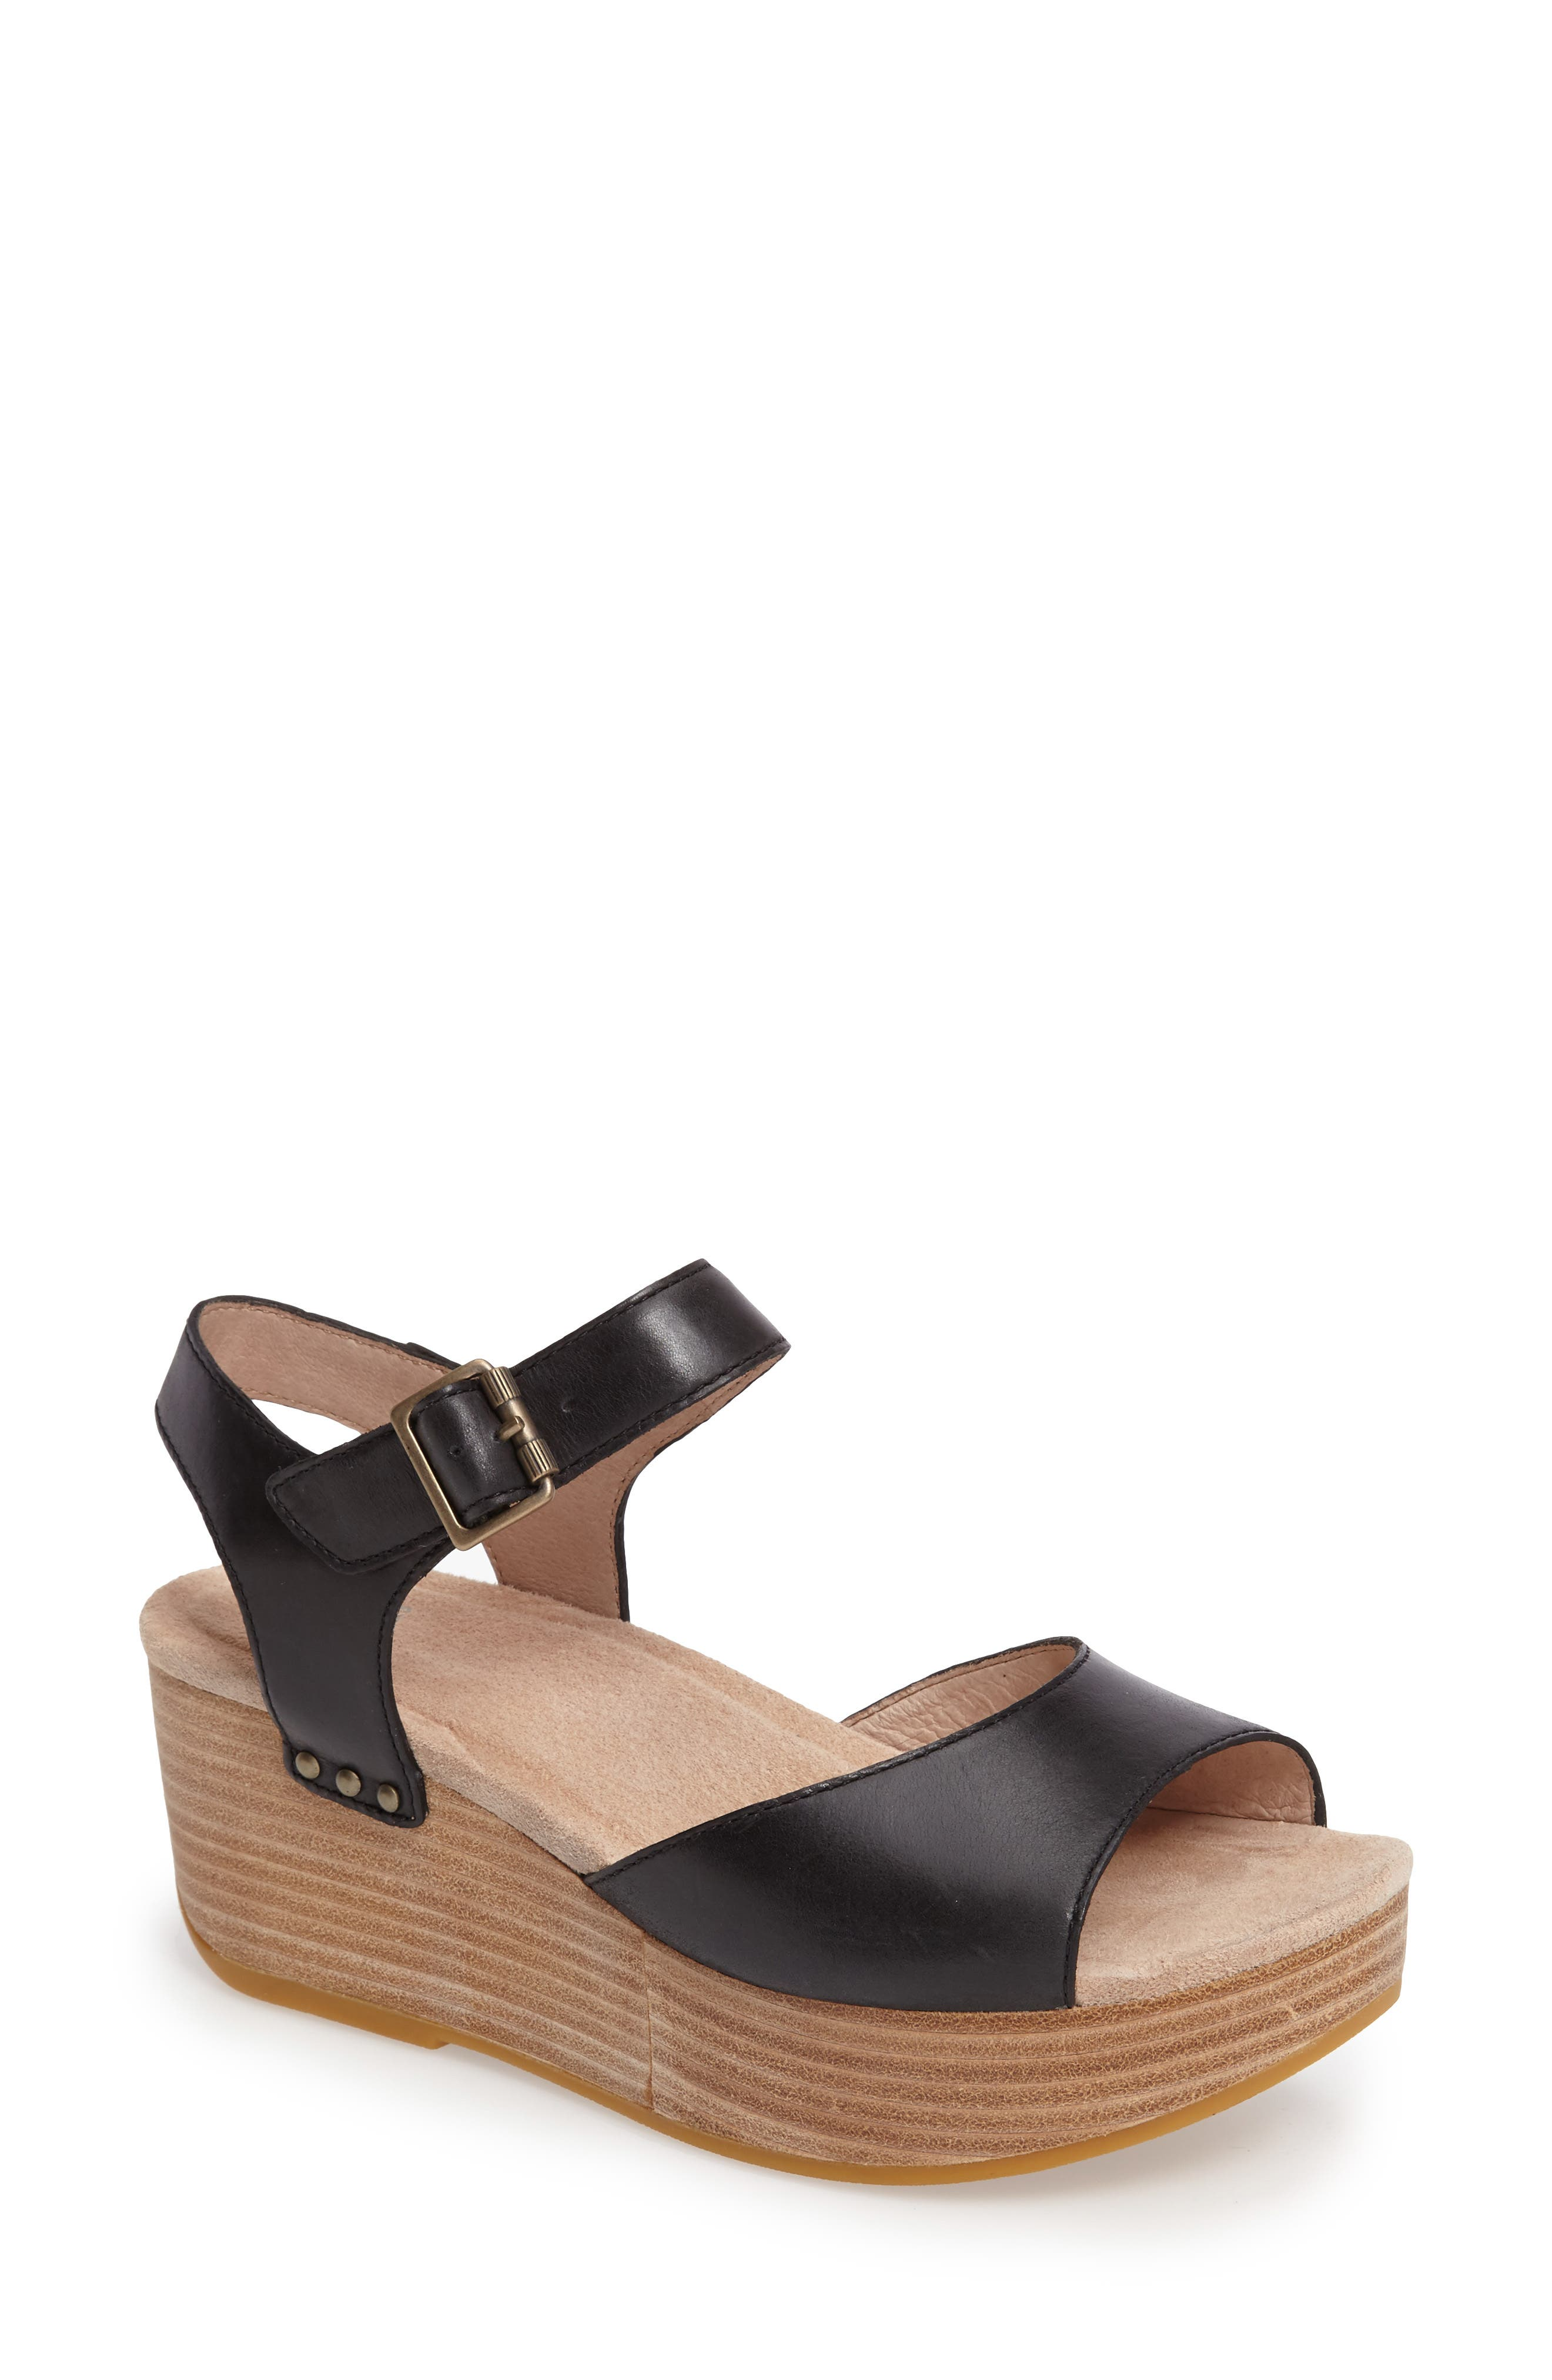 Silvie Platform Wedge Sandal,                         Main,                         color, Black Leather